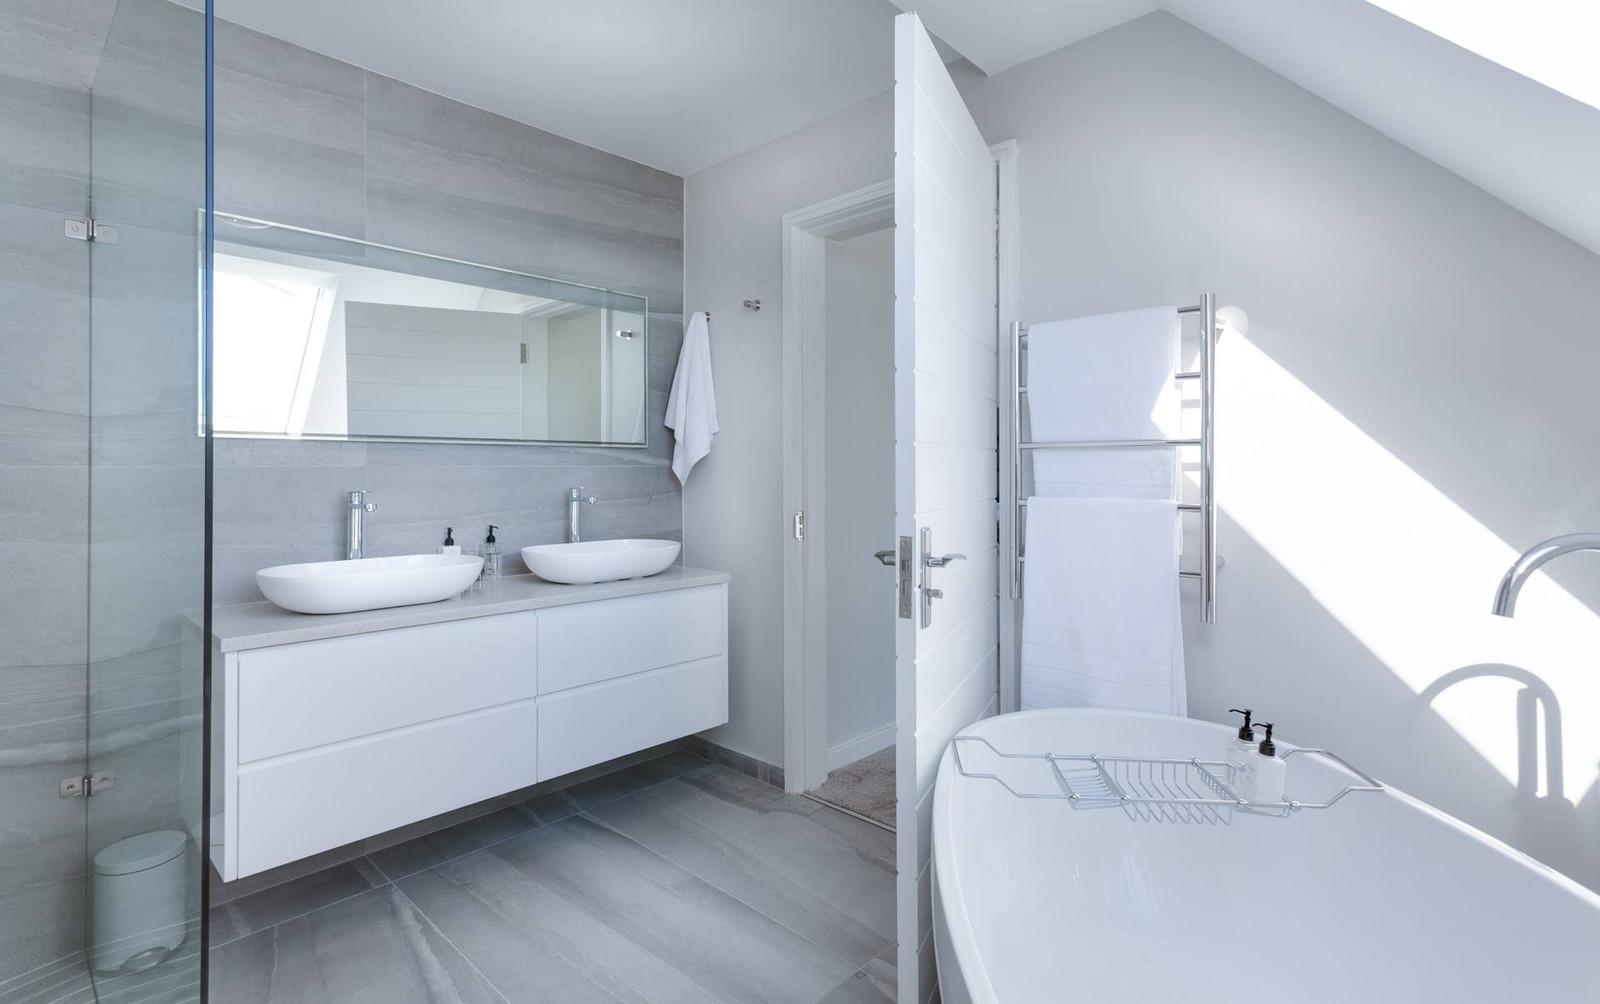 Bathrooms in Dublin, Cork, Limerick, Kerry | Bathroooms 4U